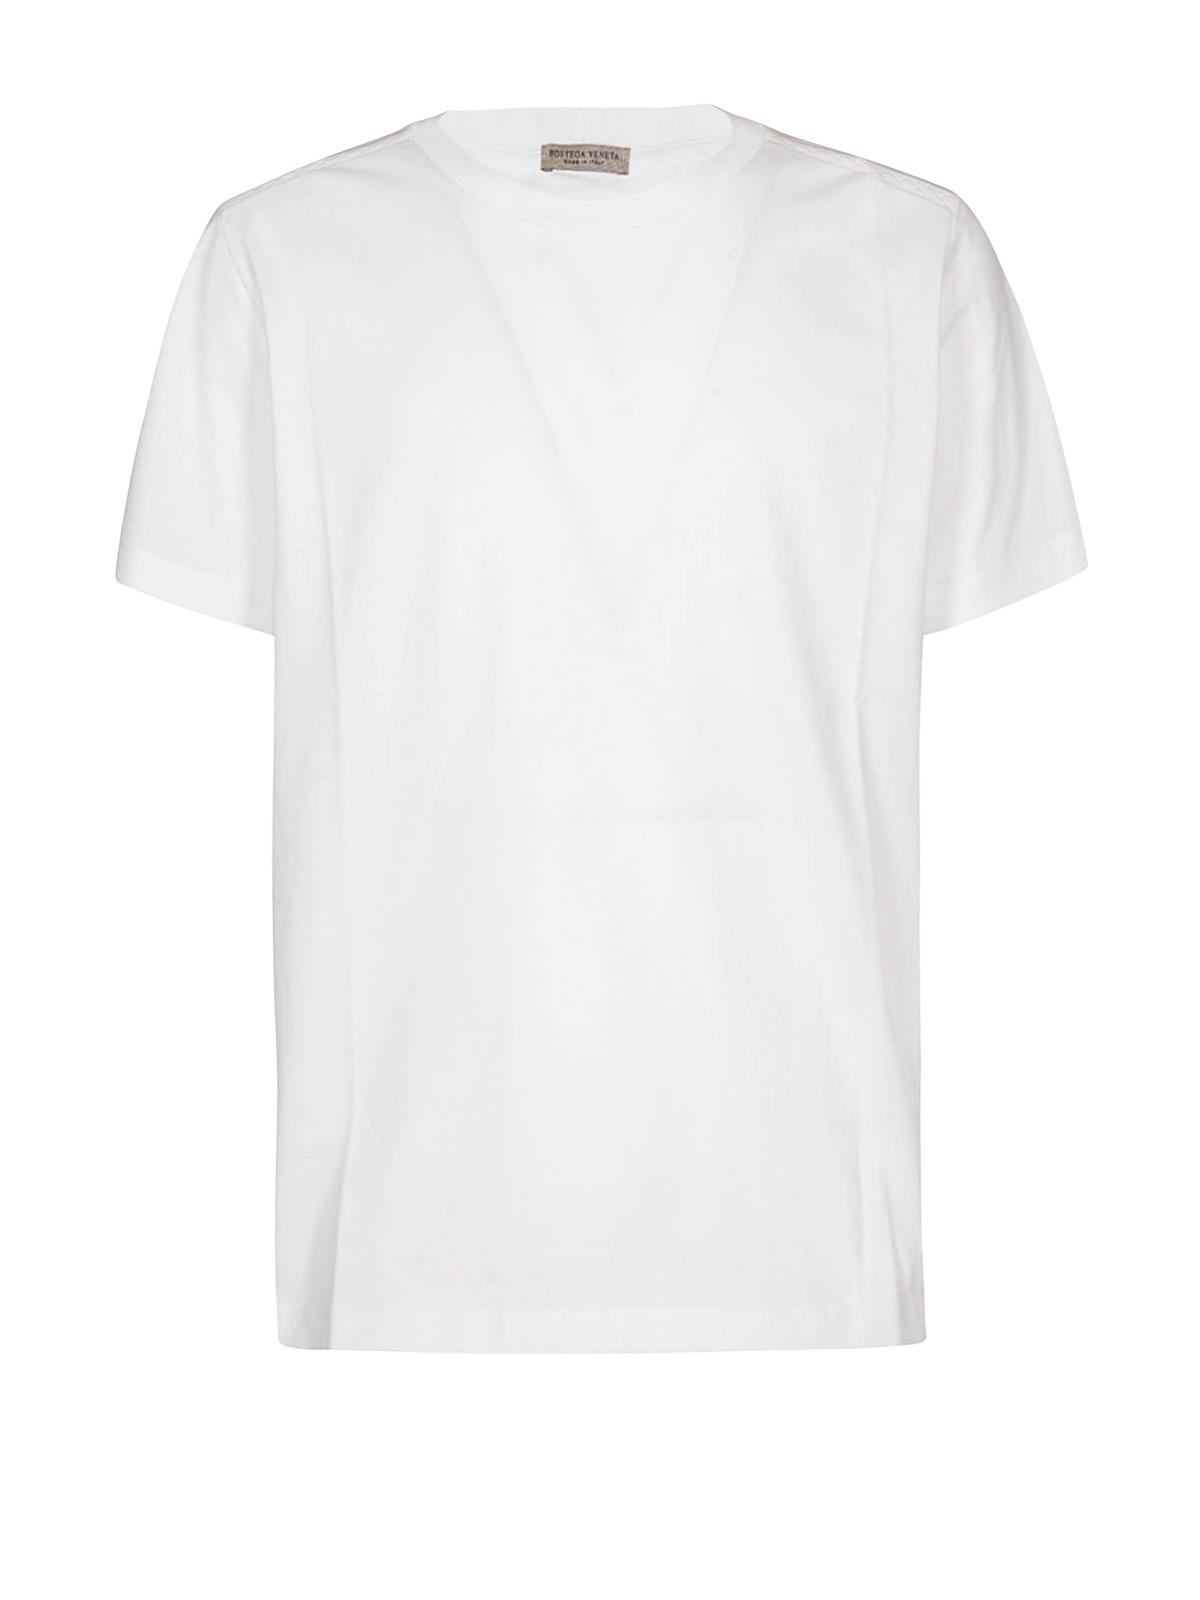 556b8378c7671 Bottega Veneta - Intrecciato pattern white T-shirt - t-shirts ...